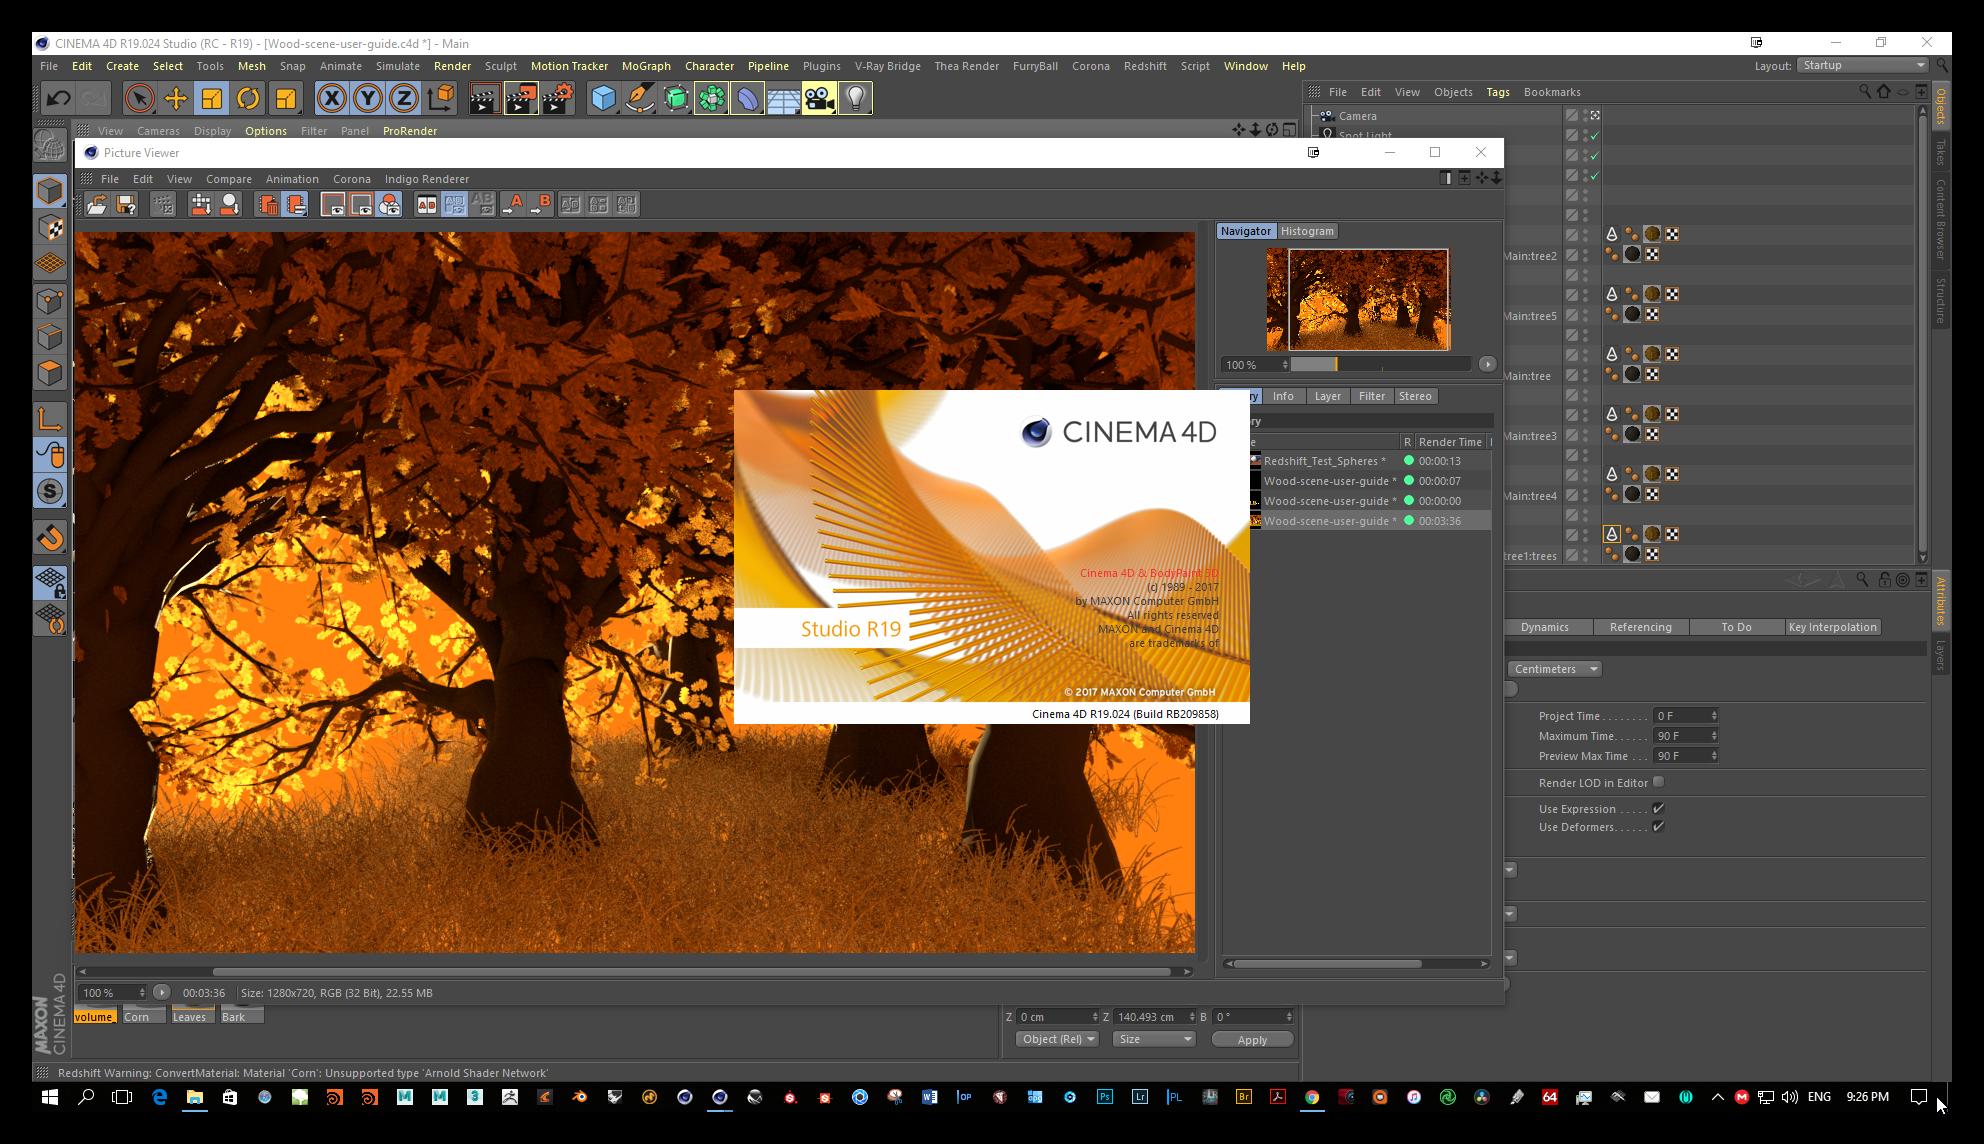 Win/Mac版-C4D R19三维软件Maxon CINEMA 4D Studio R19.053  中文版/英文版/破解版(含序列号+安装教程) 免费下载